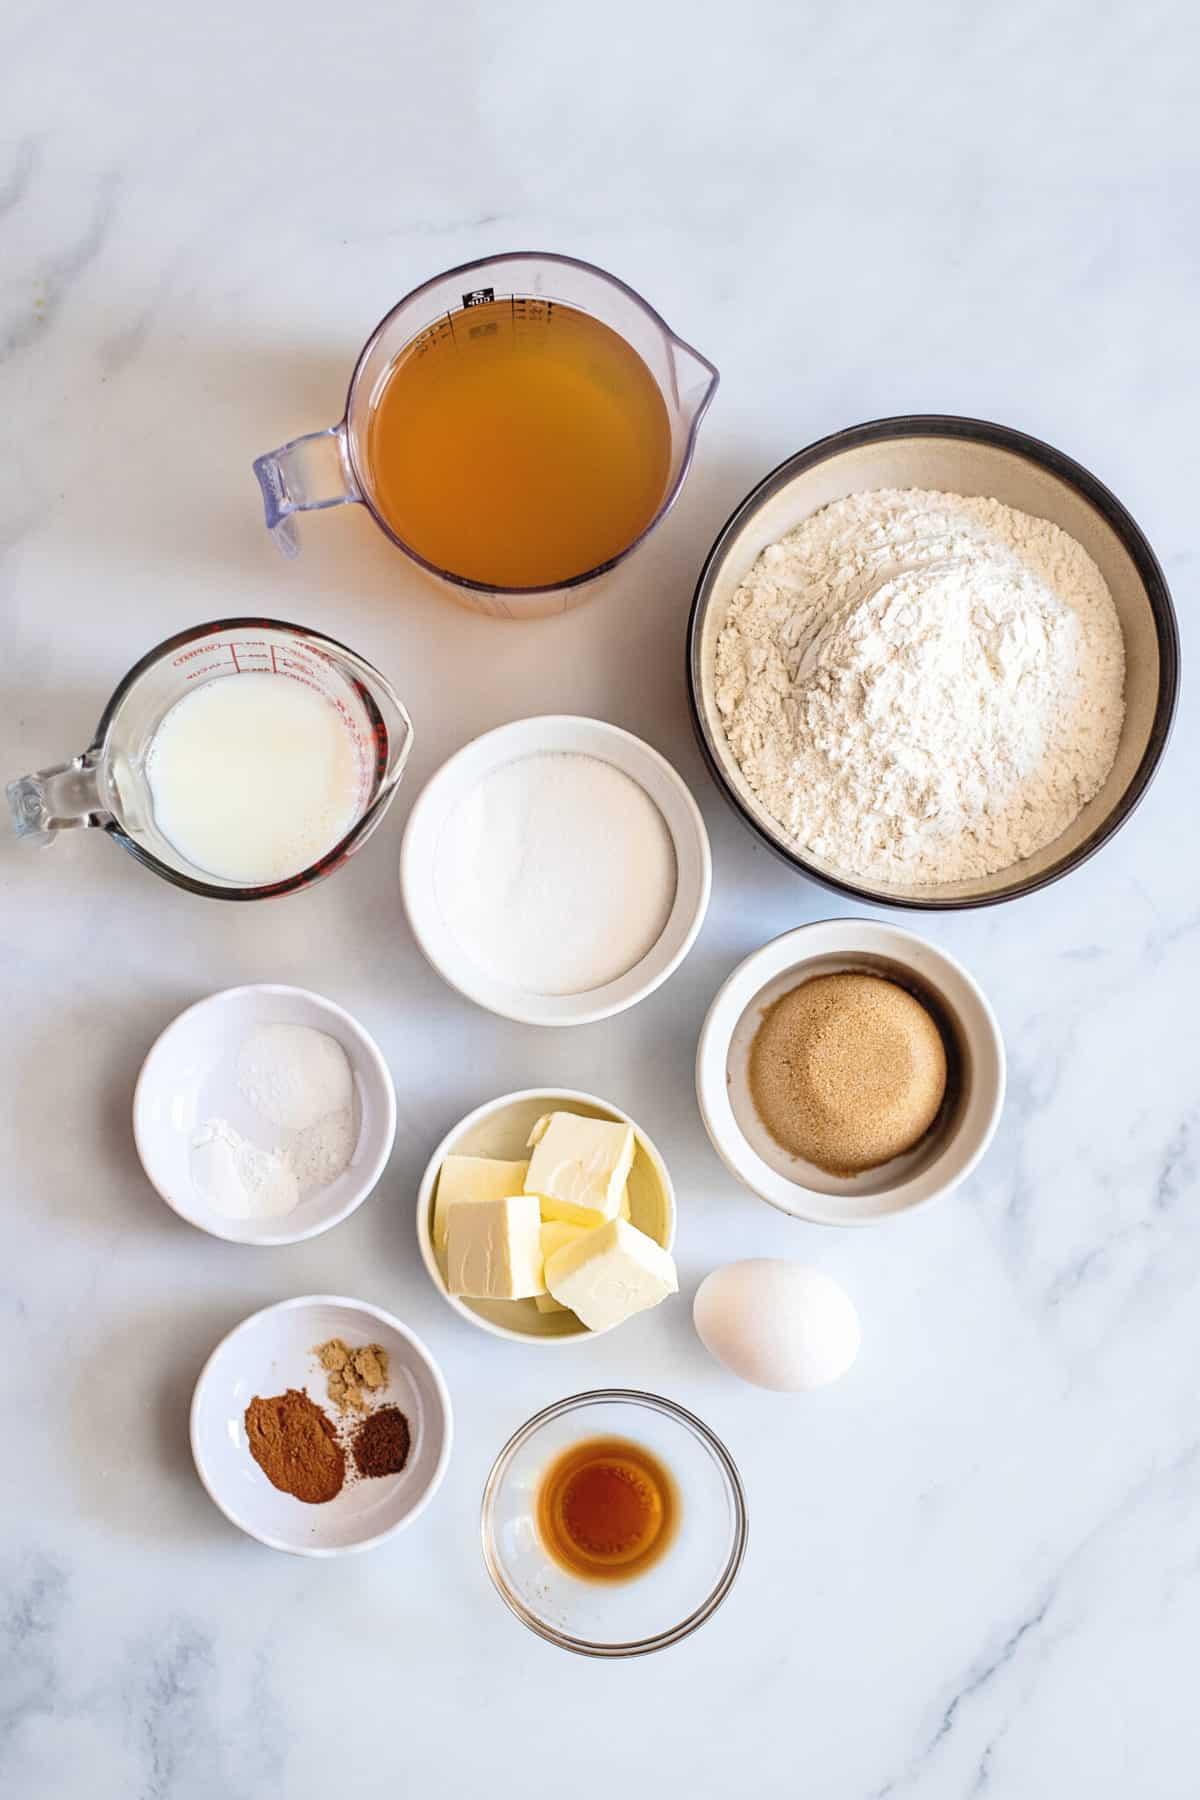 Ingredients for baked apple cider donut recipe.